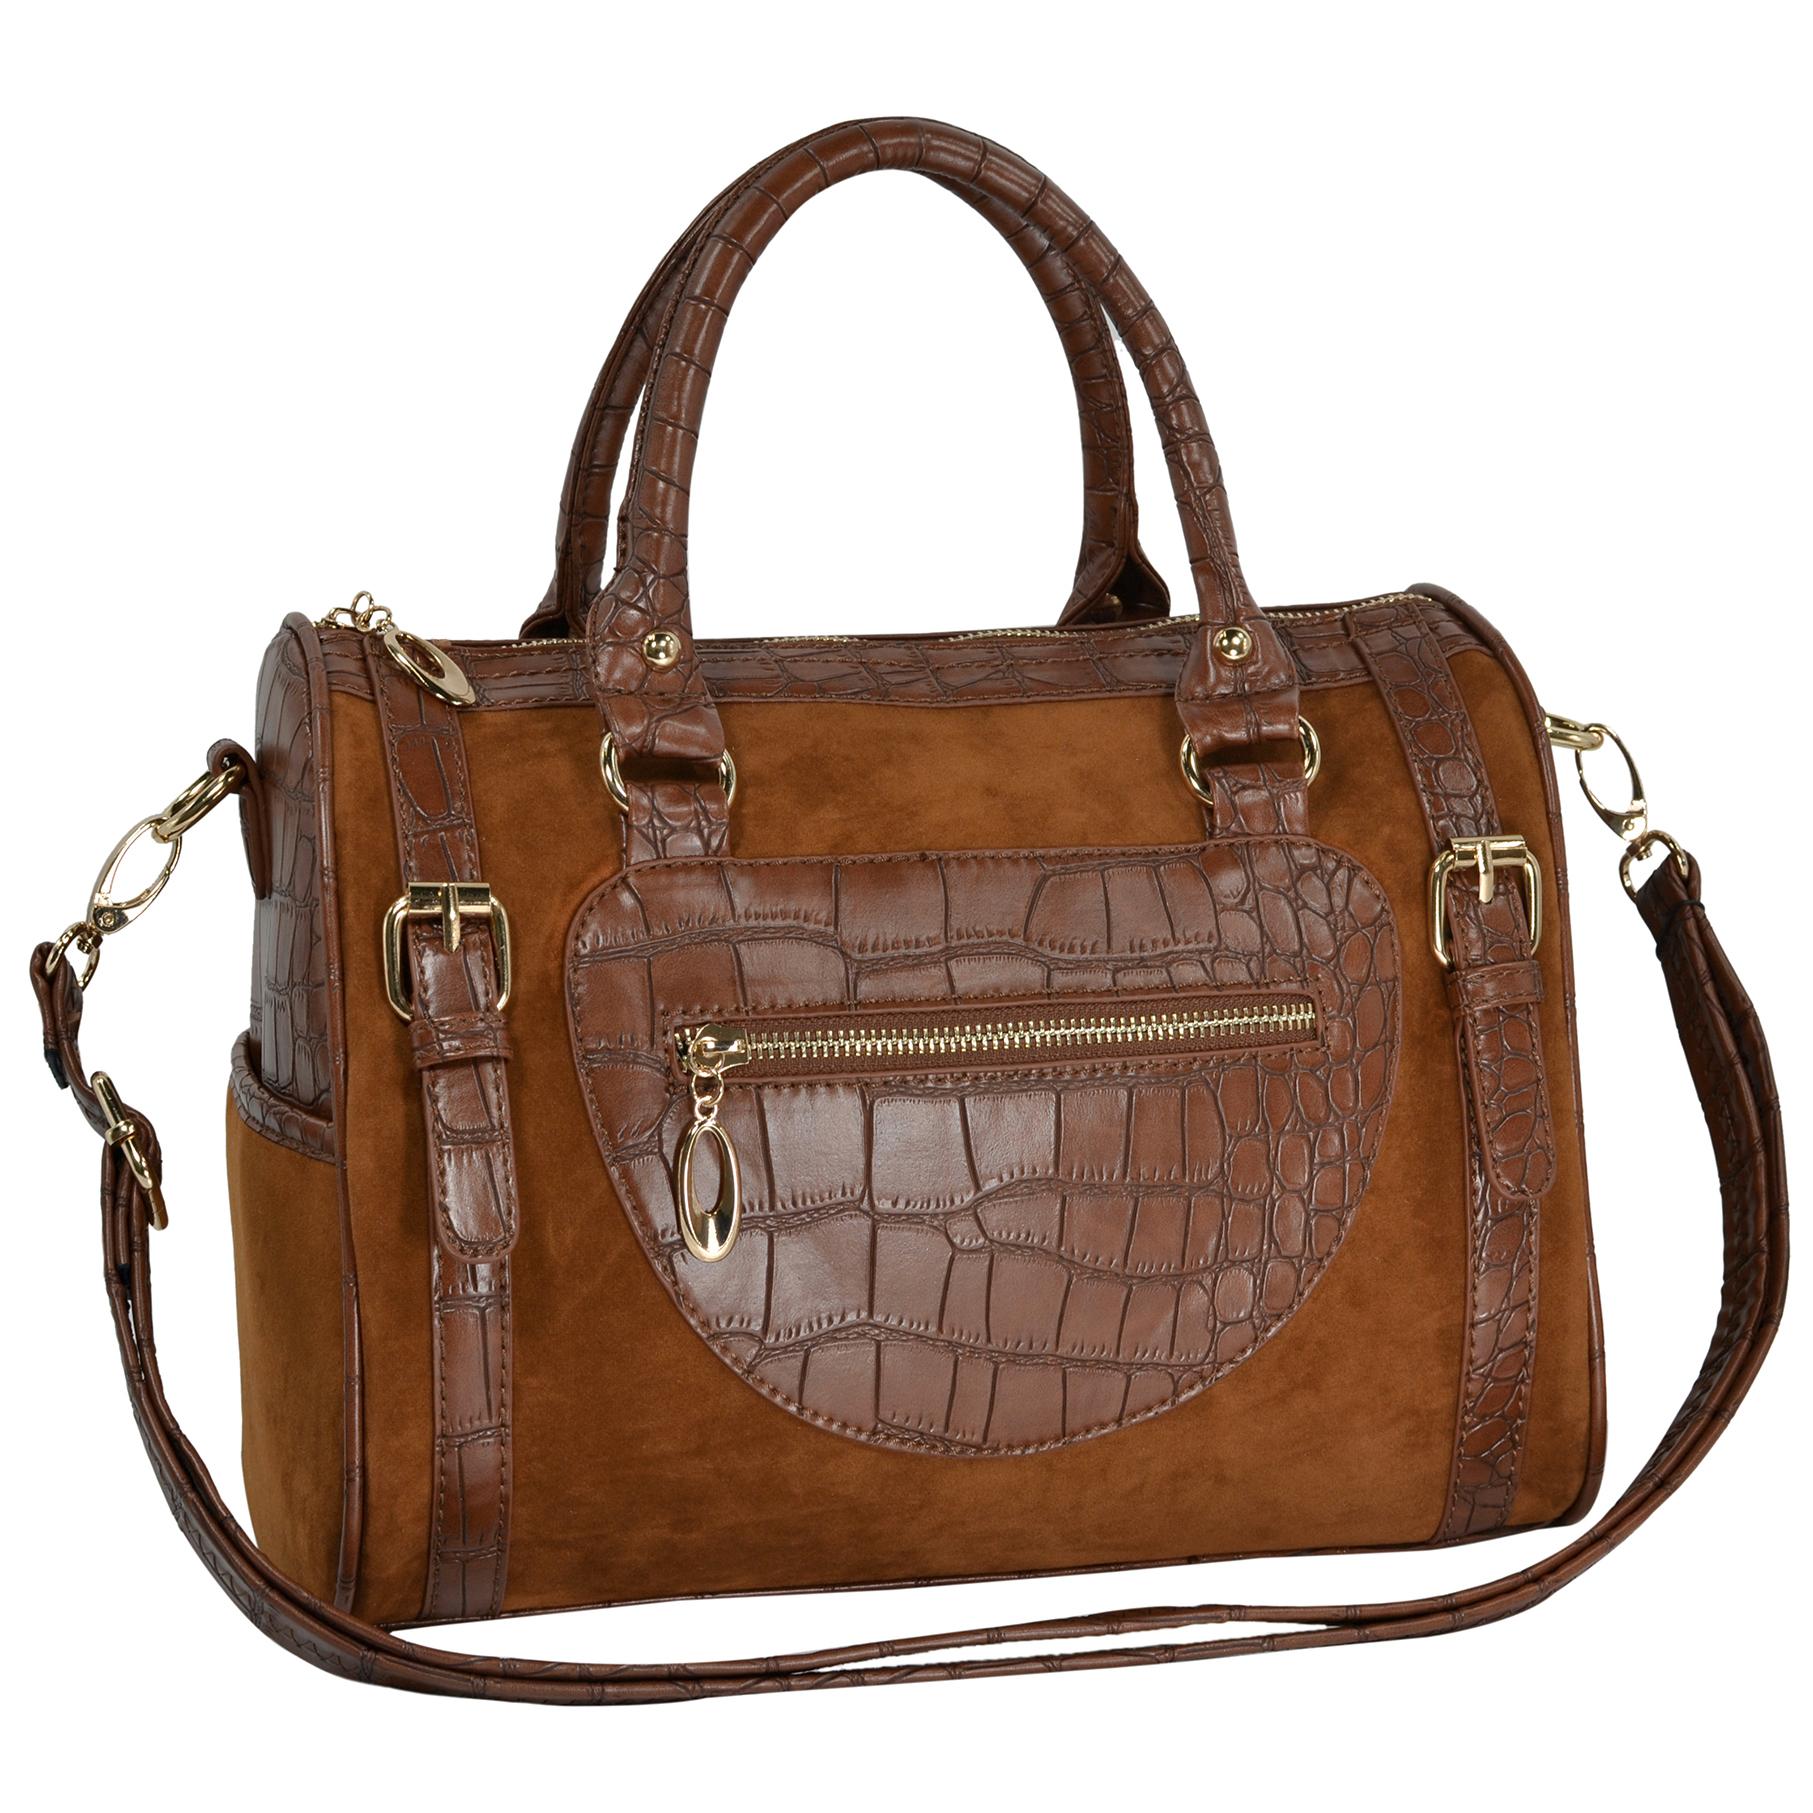 mg-collection-brandi-brown-bowler-handbag-tb-h0339brn-2.jpg